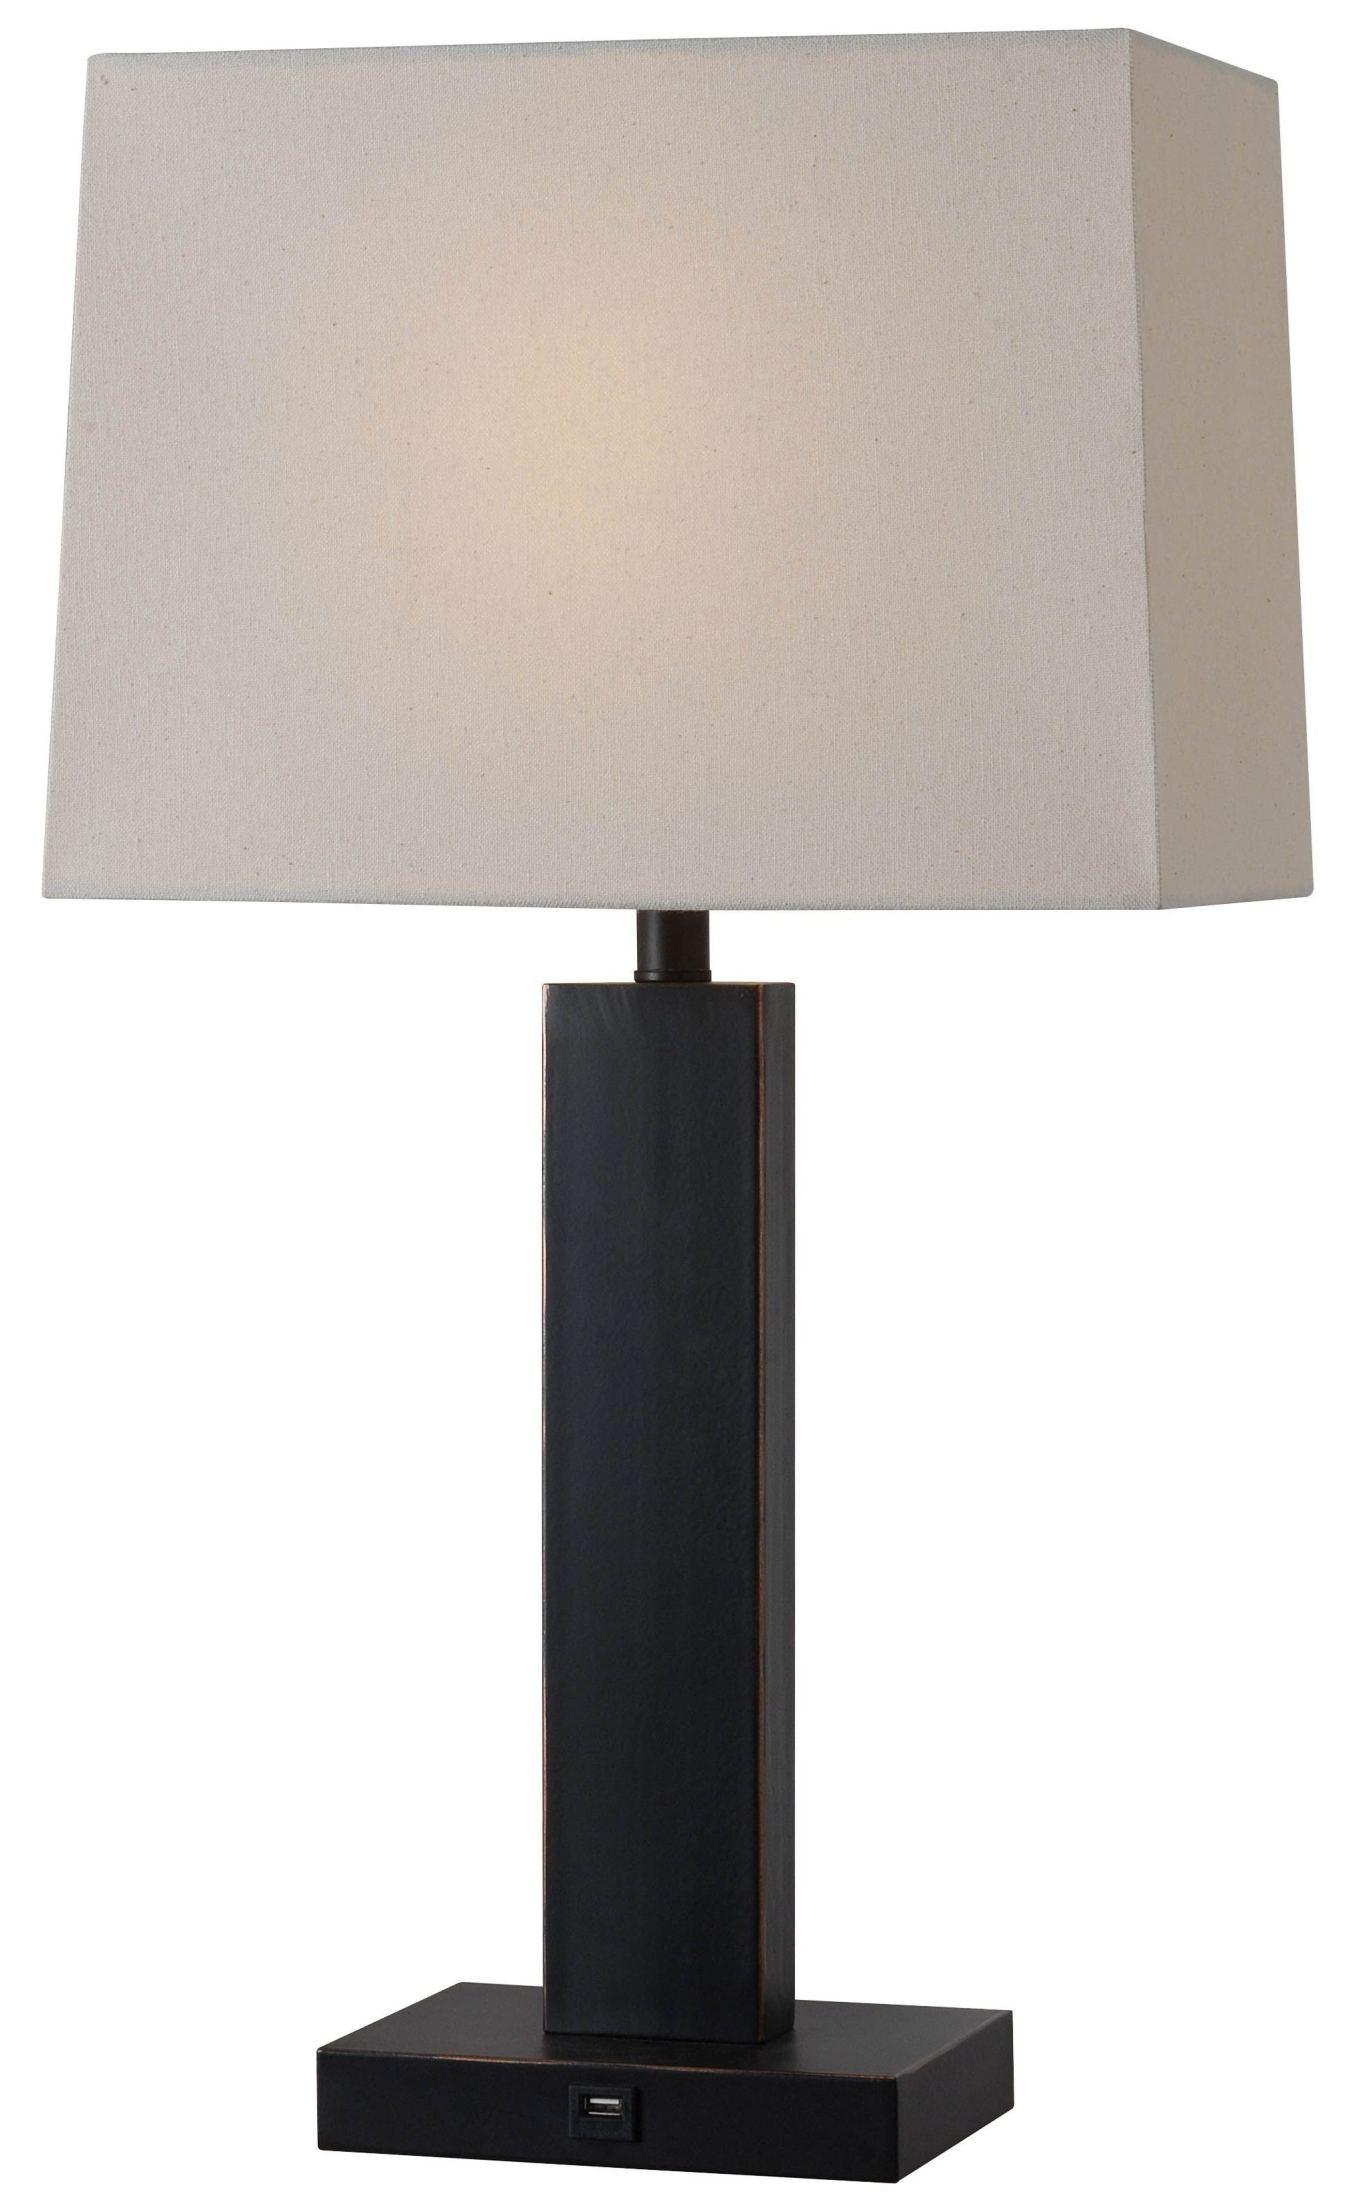 innkeeper oil rubbed bronze table lamp 32758orb kenroy home. Black Bedroom Furniture Sets. Home Design Ideas